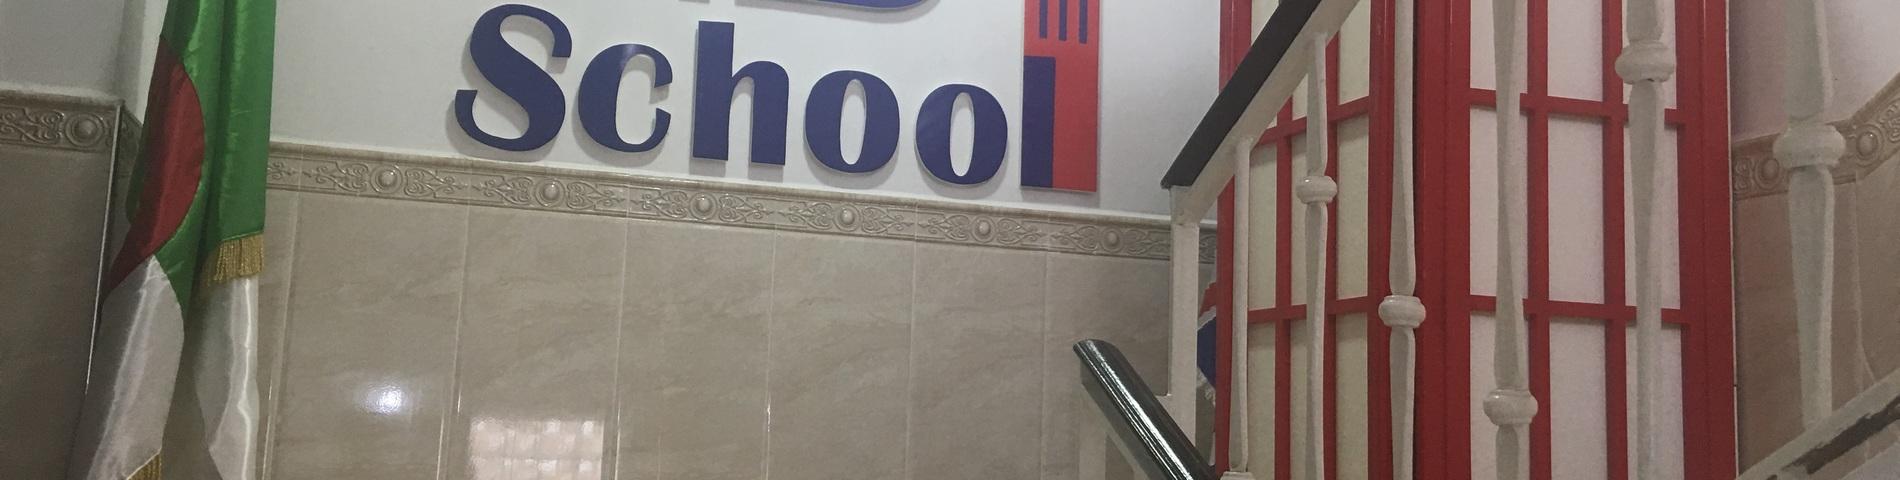 ABI School bild 1